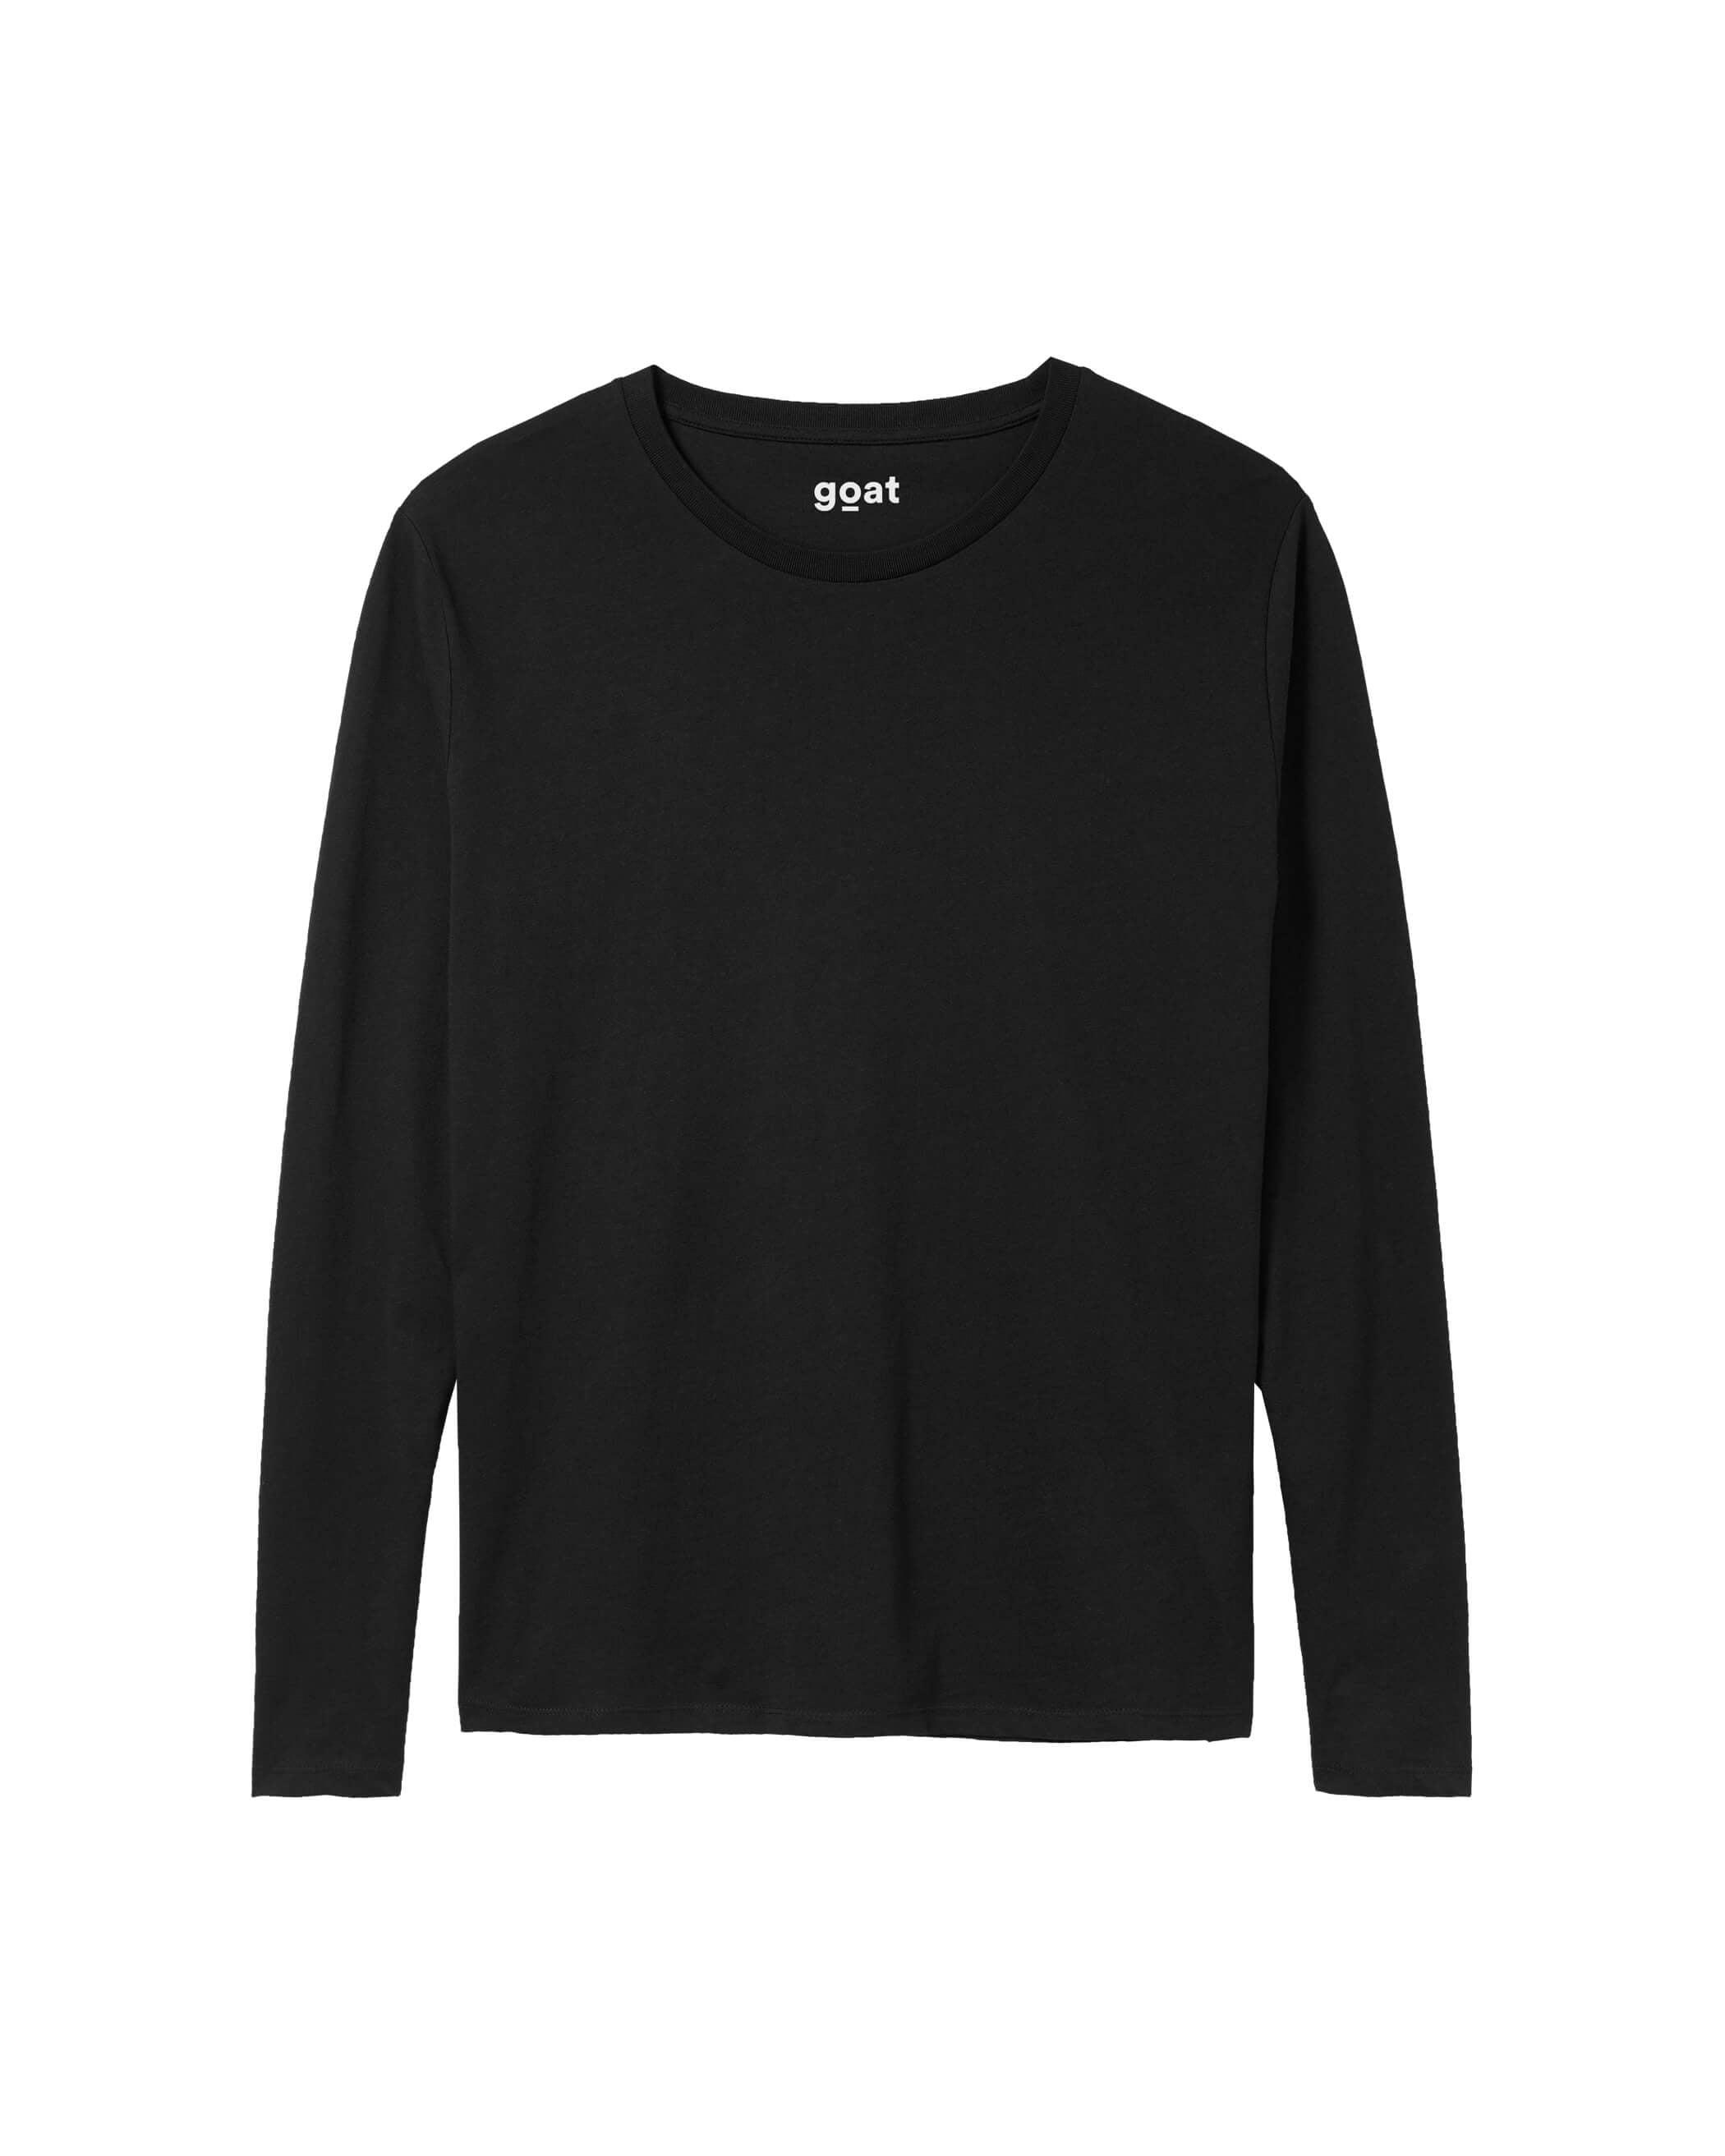 Sloan Long Sleeve Black